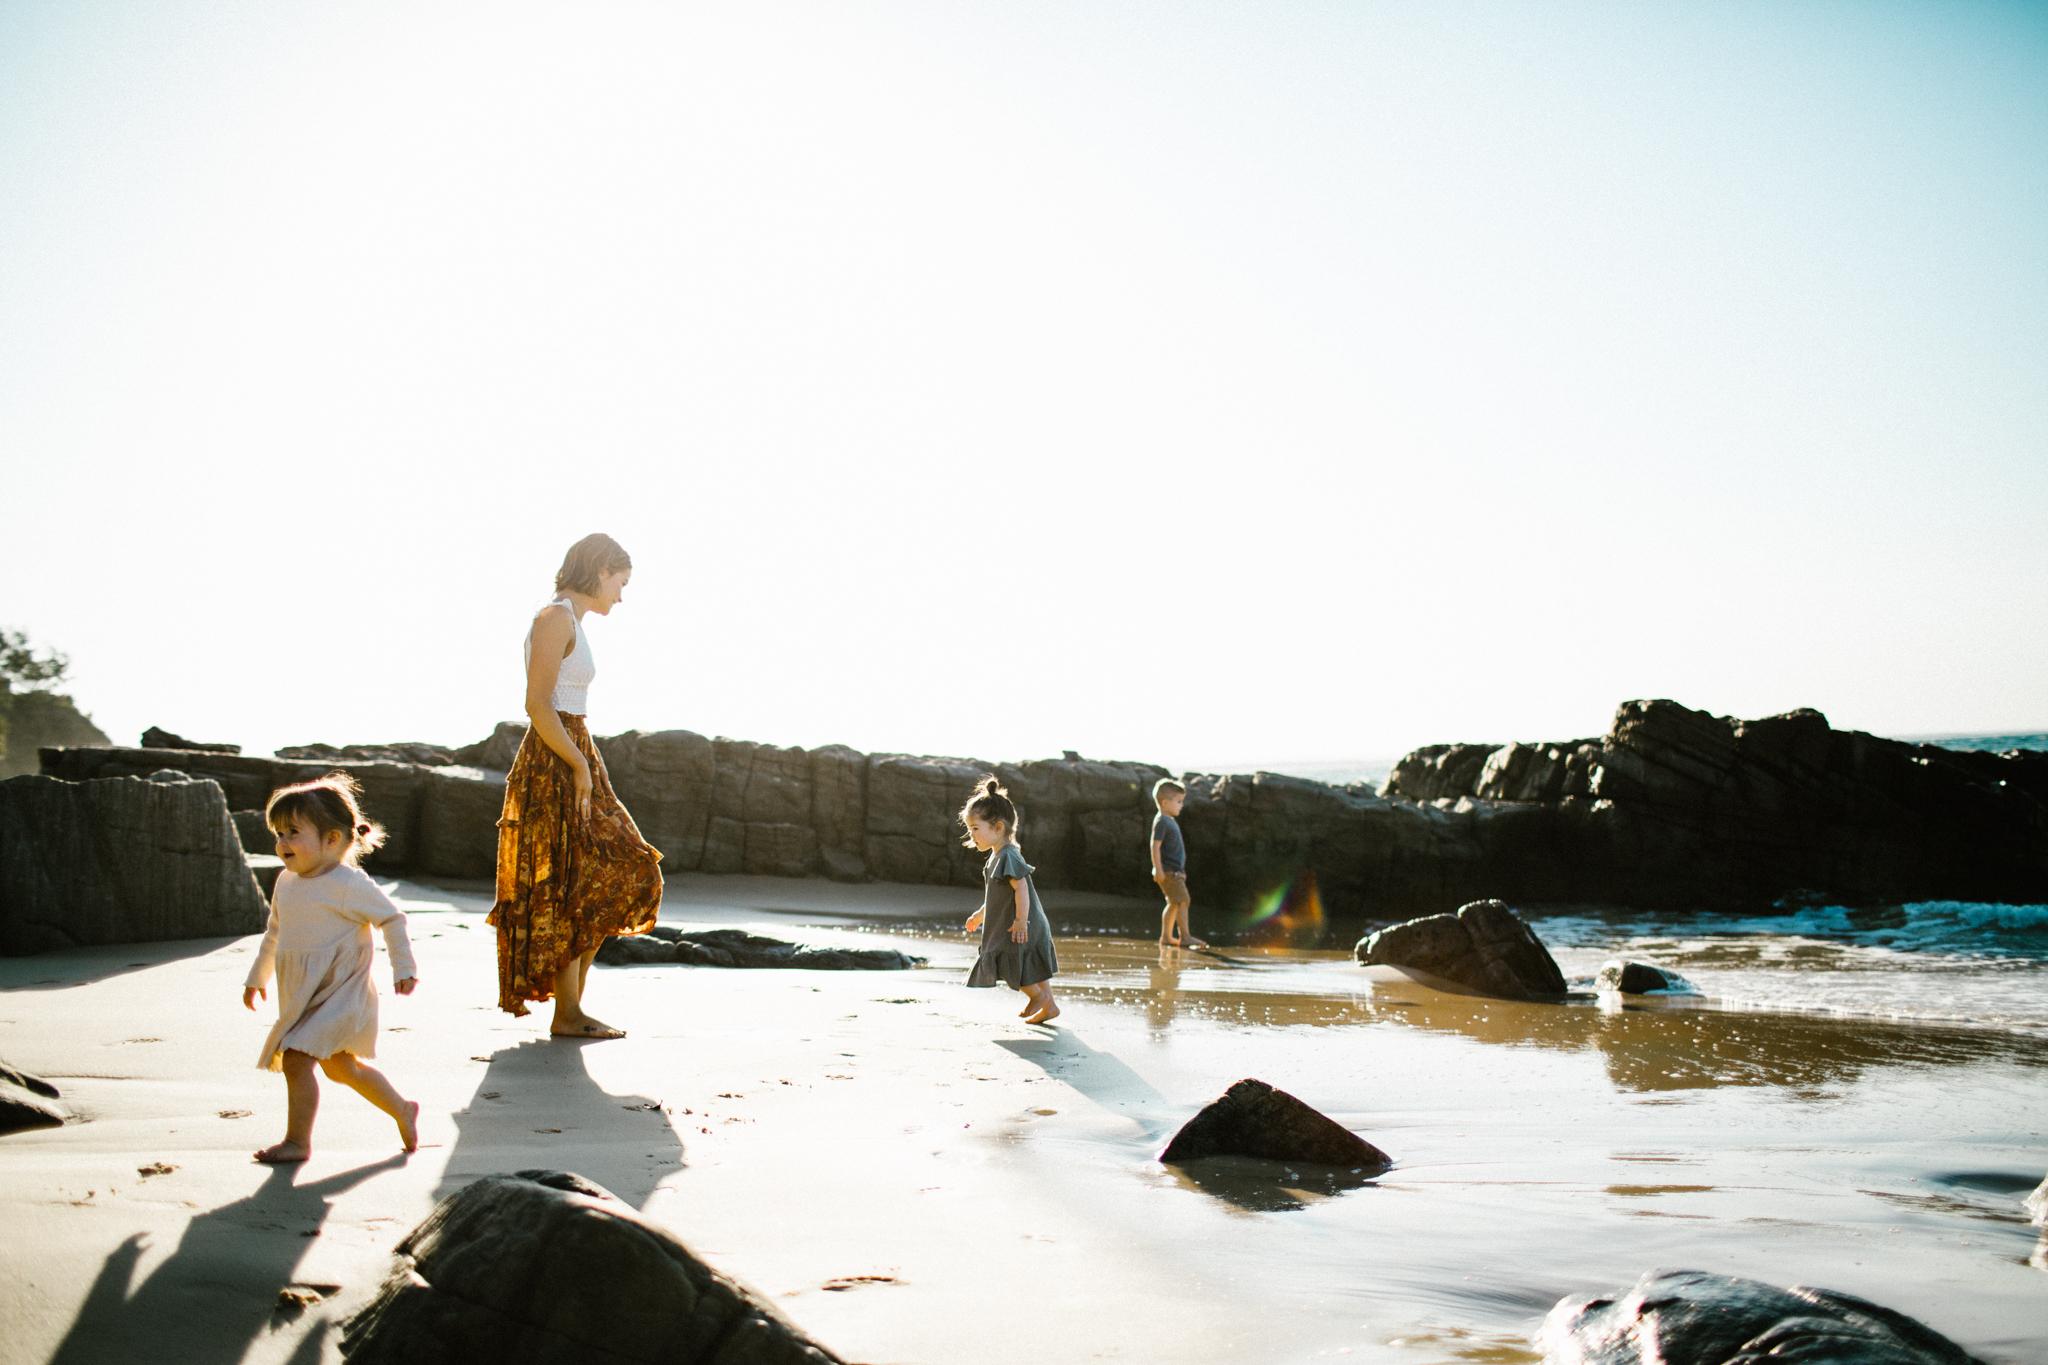 marina locke-3.jpg